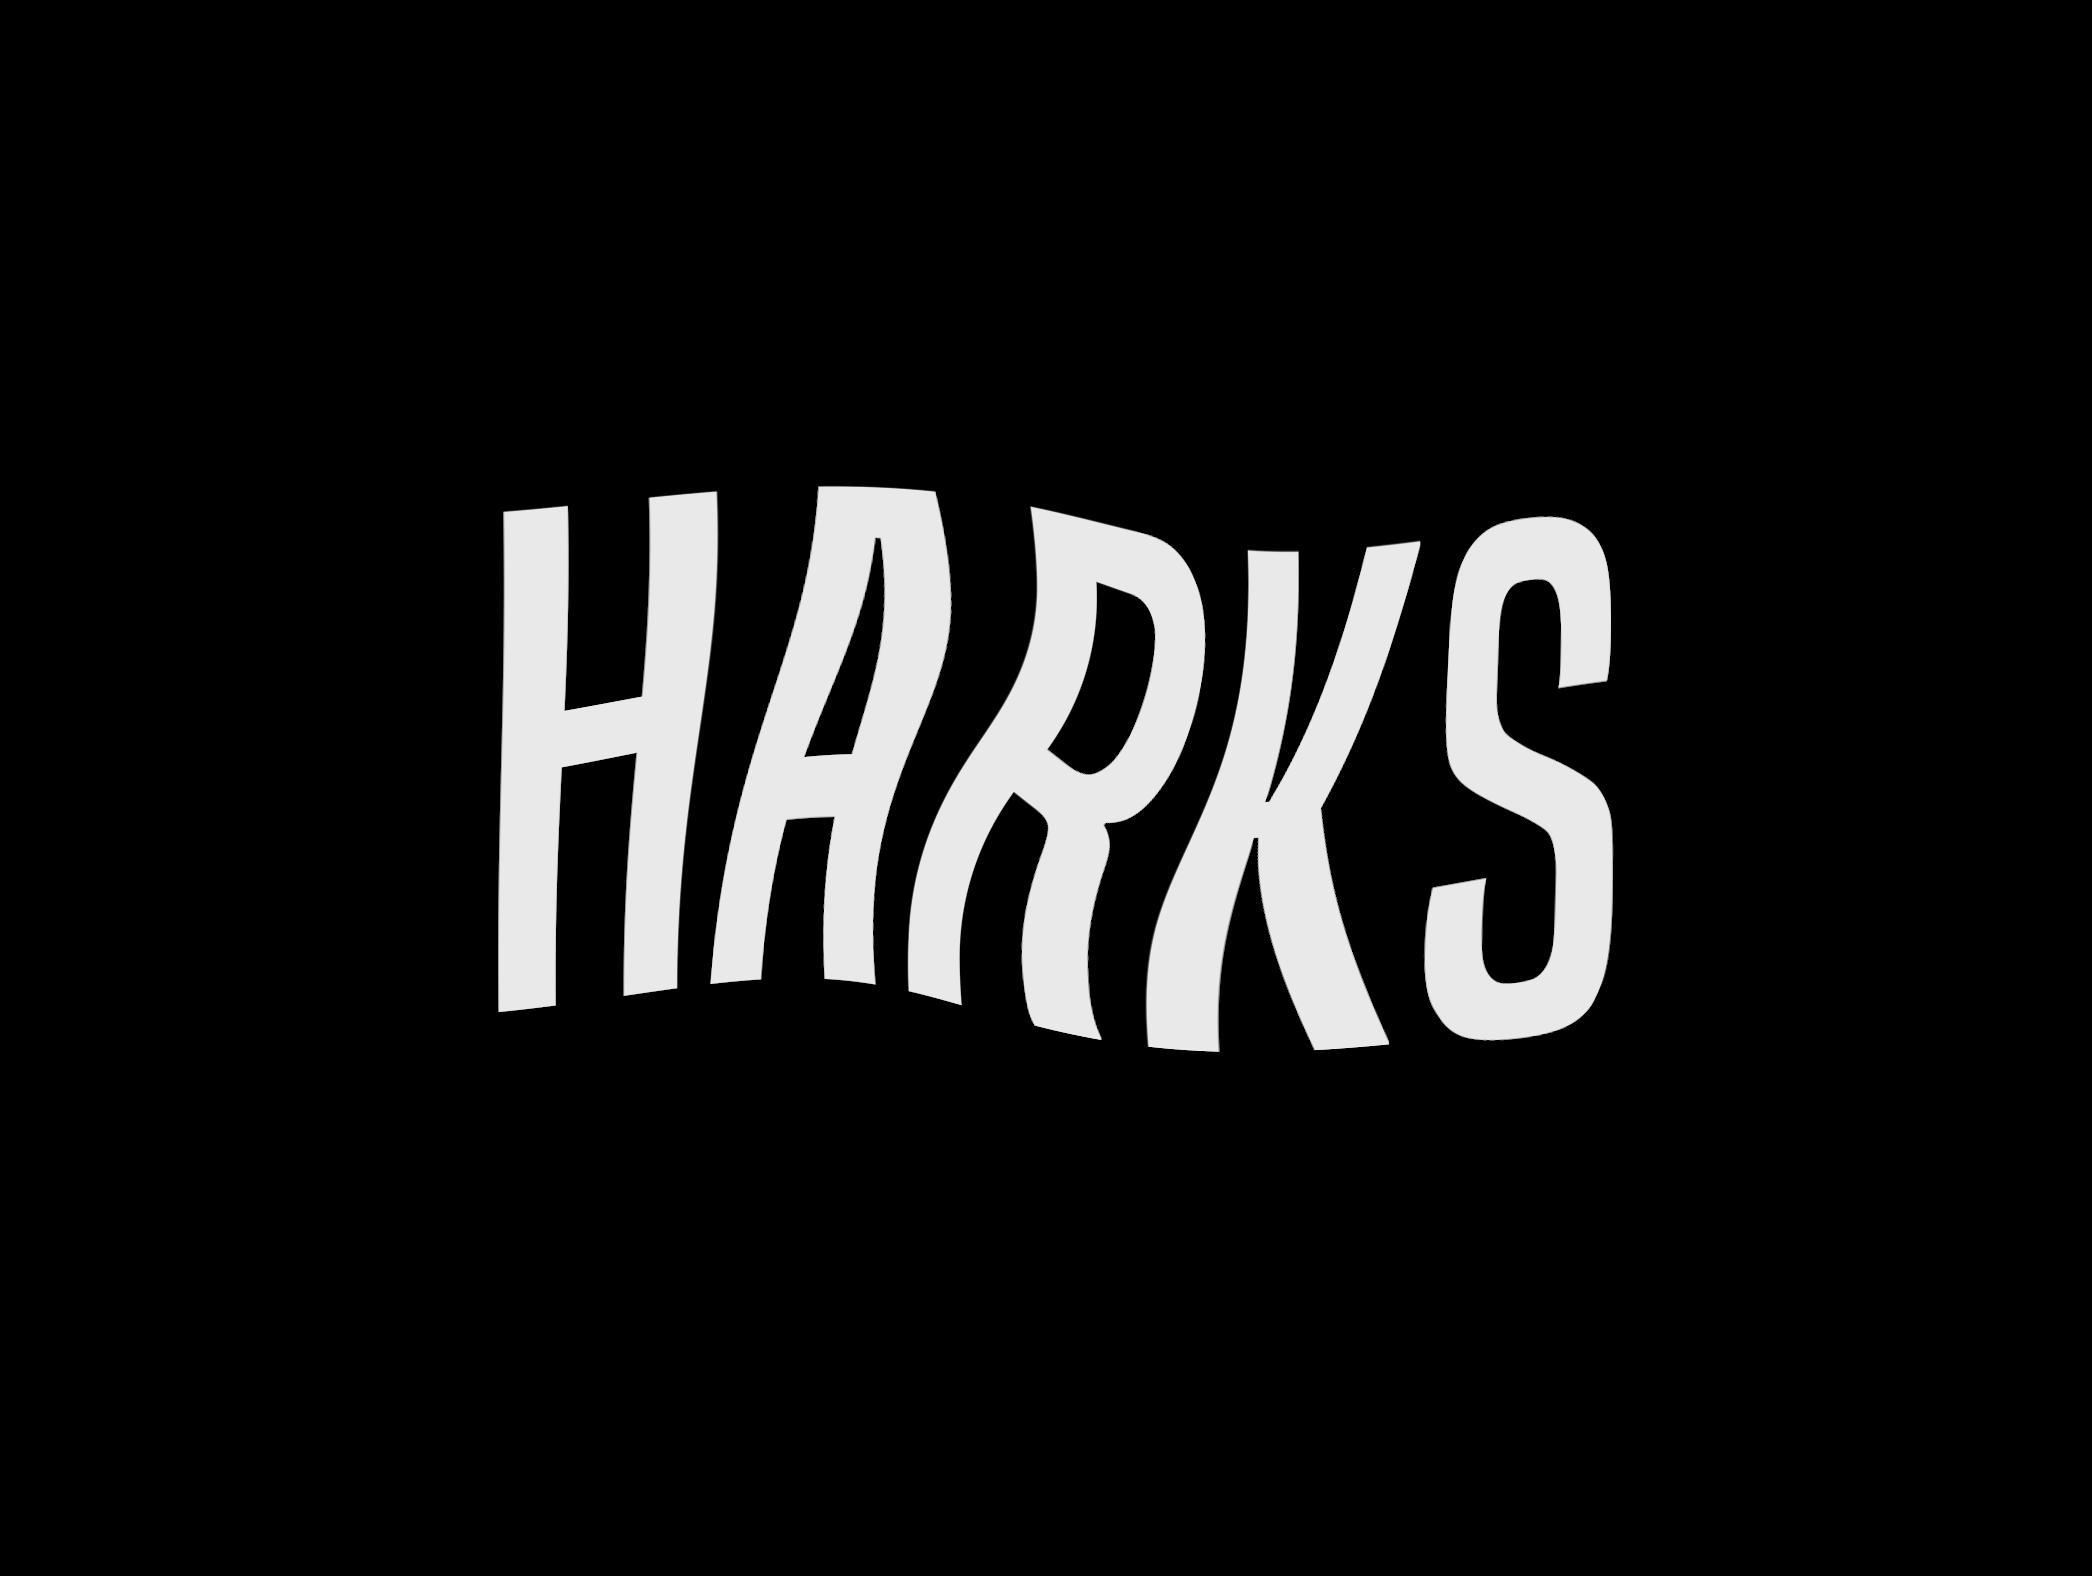 HARKS